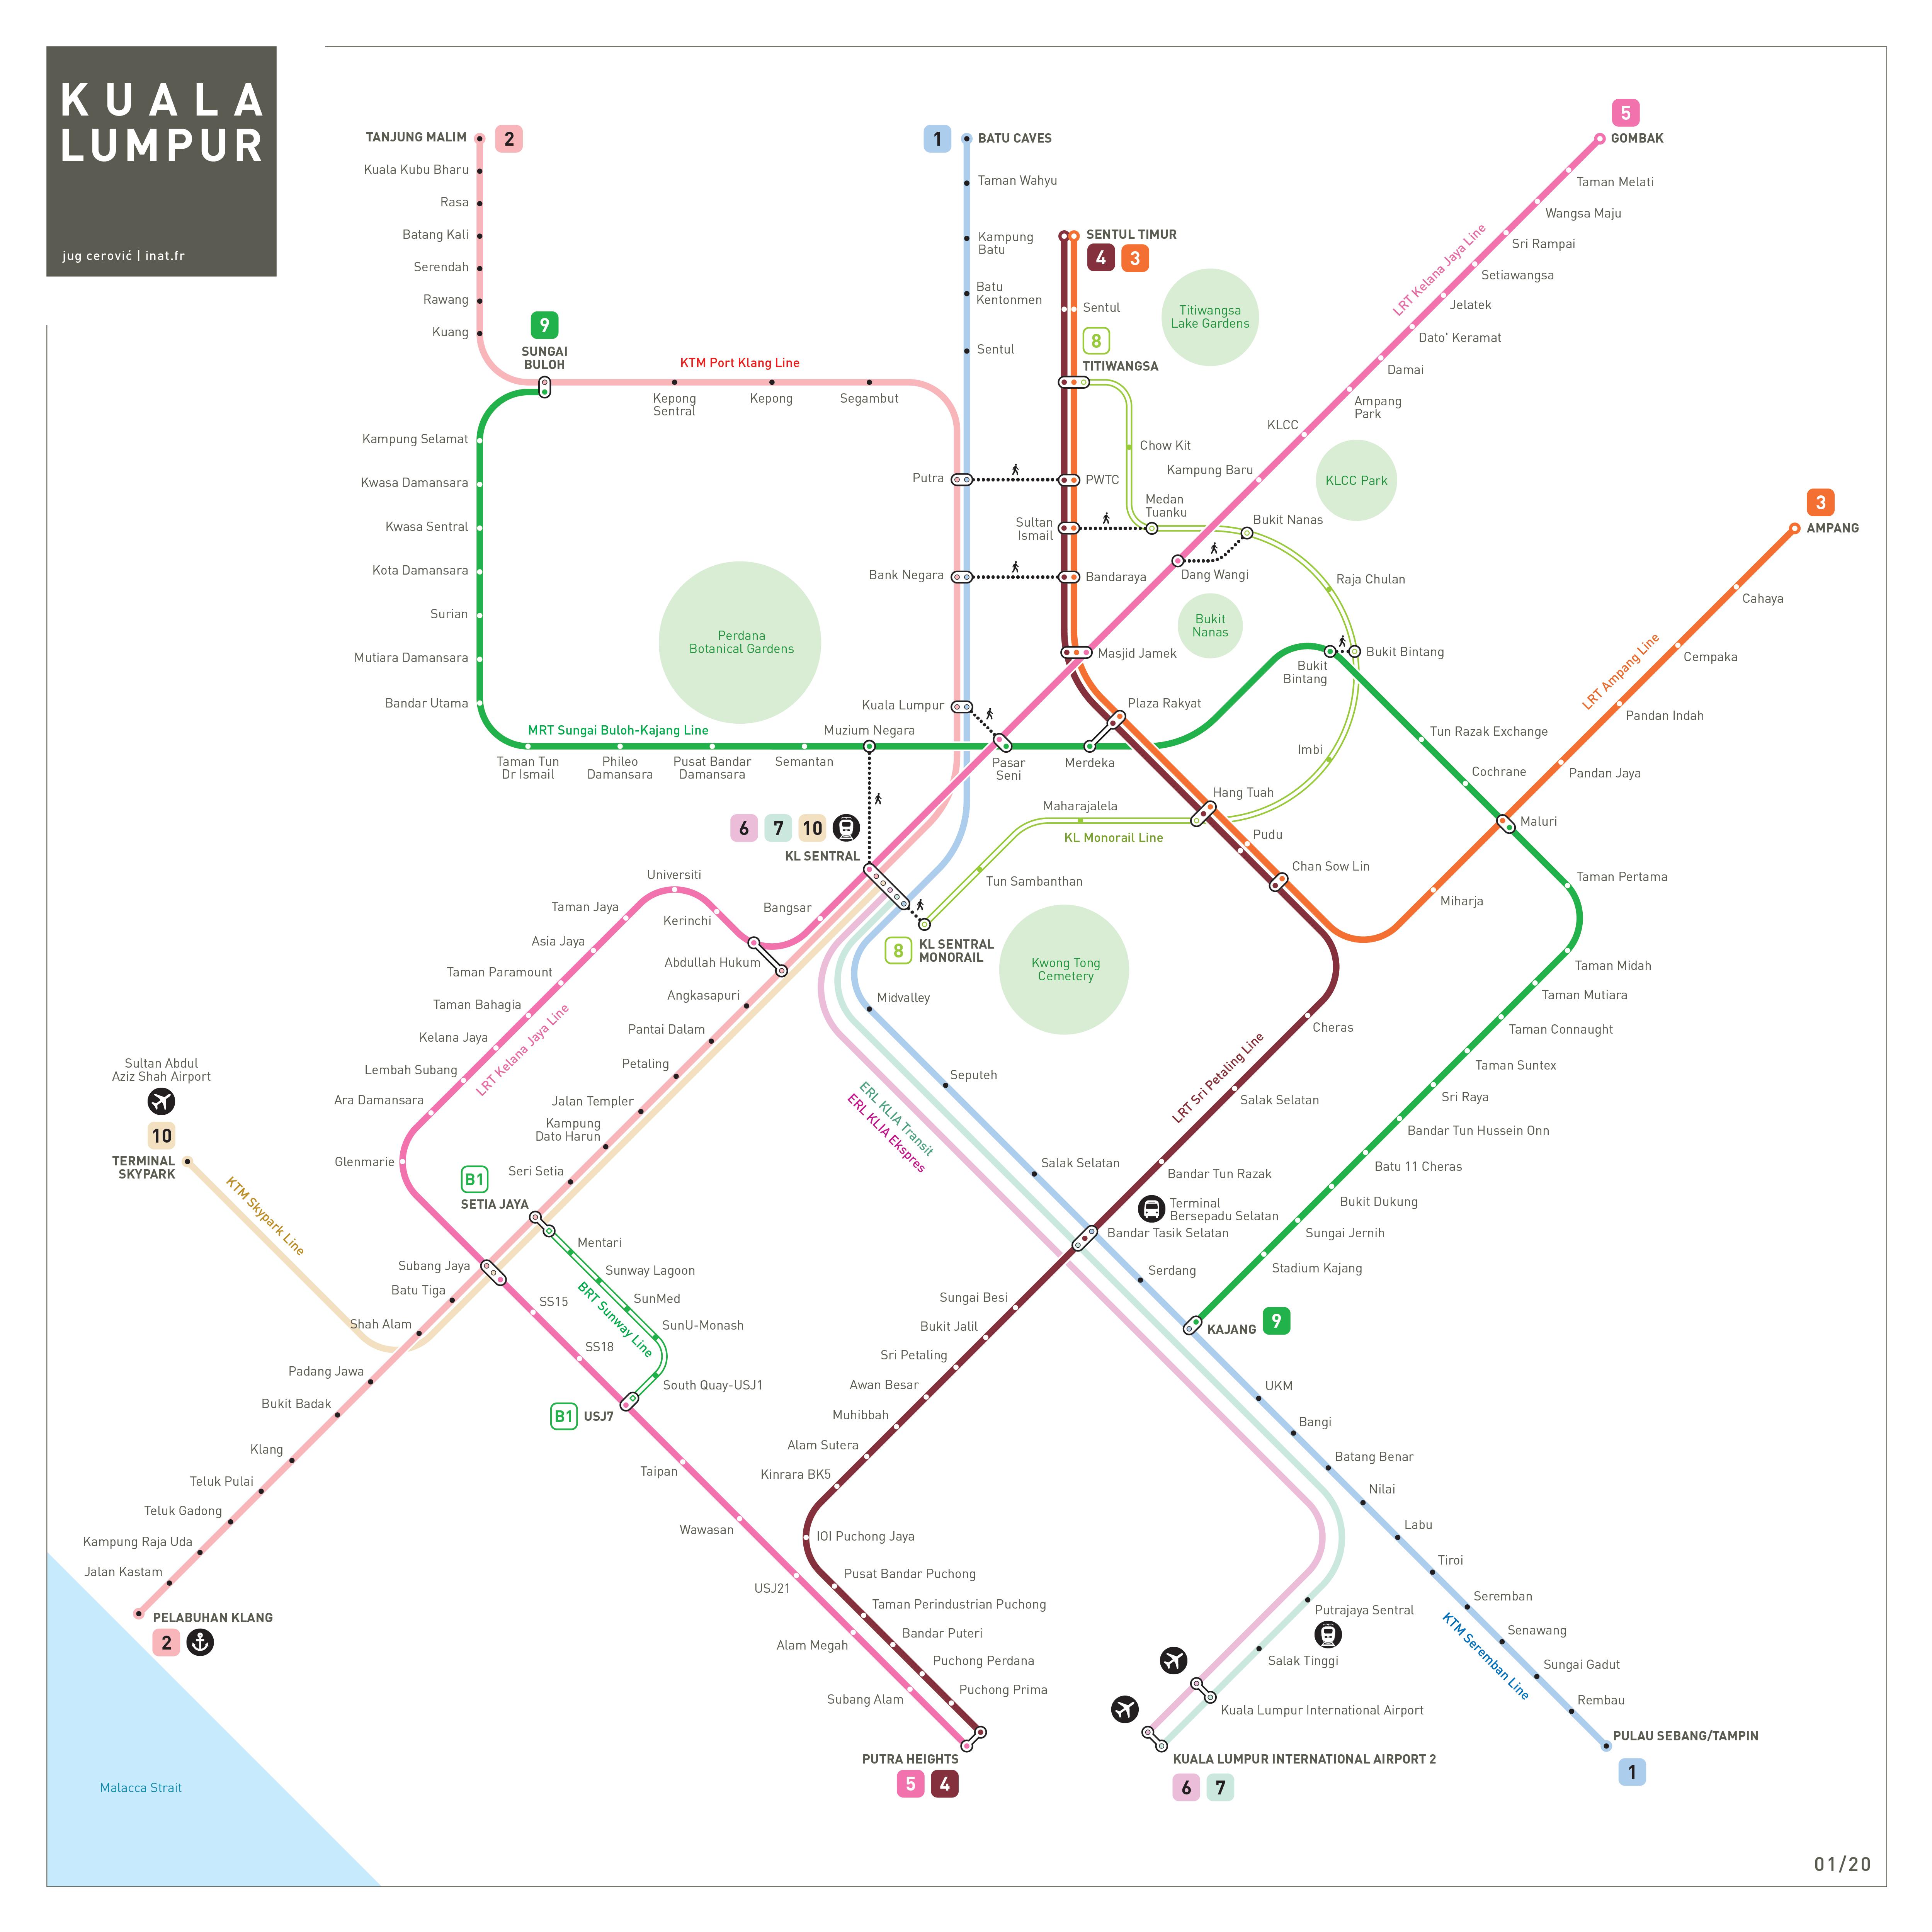 Kuala Lumpur Metro Map Mapping and Wayfinding